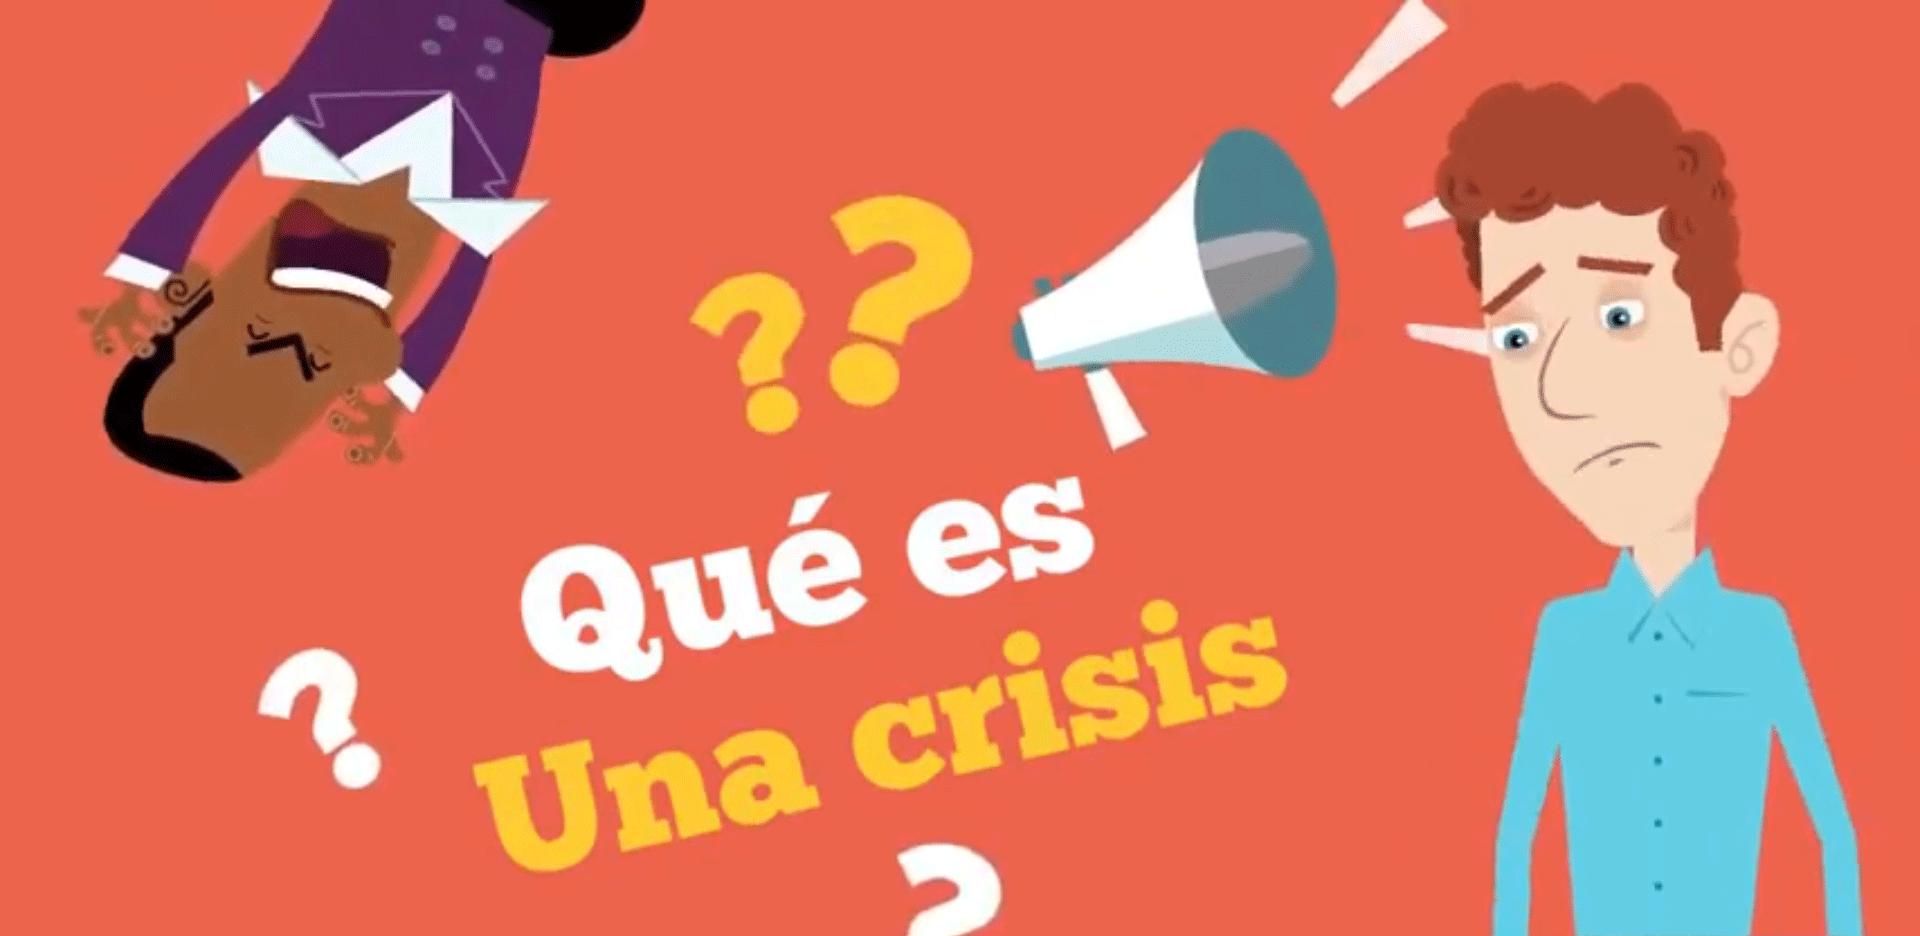 Guía de intervención en crisis